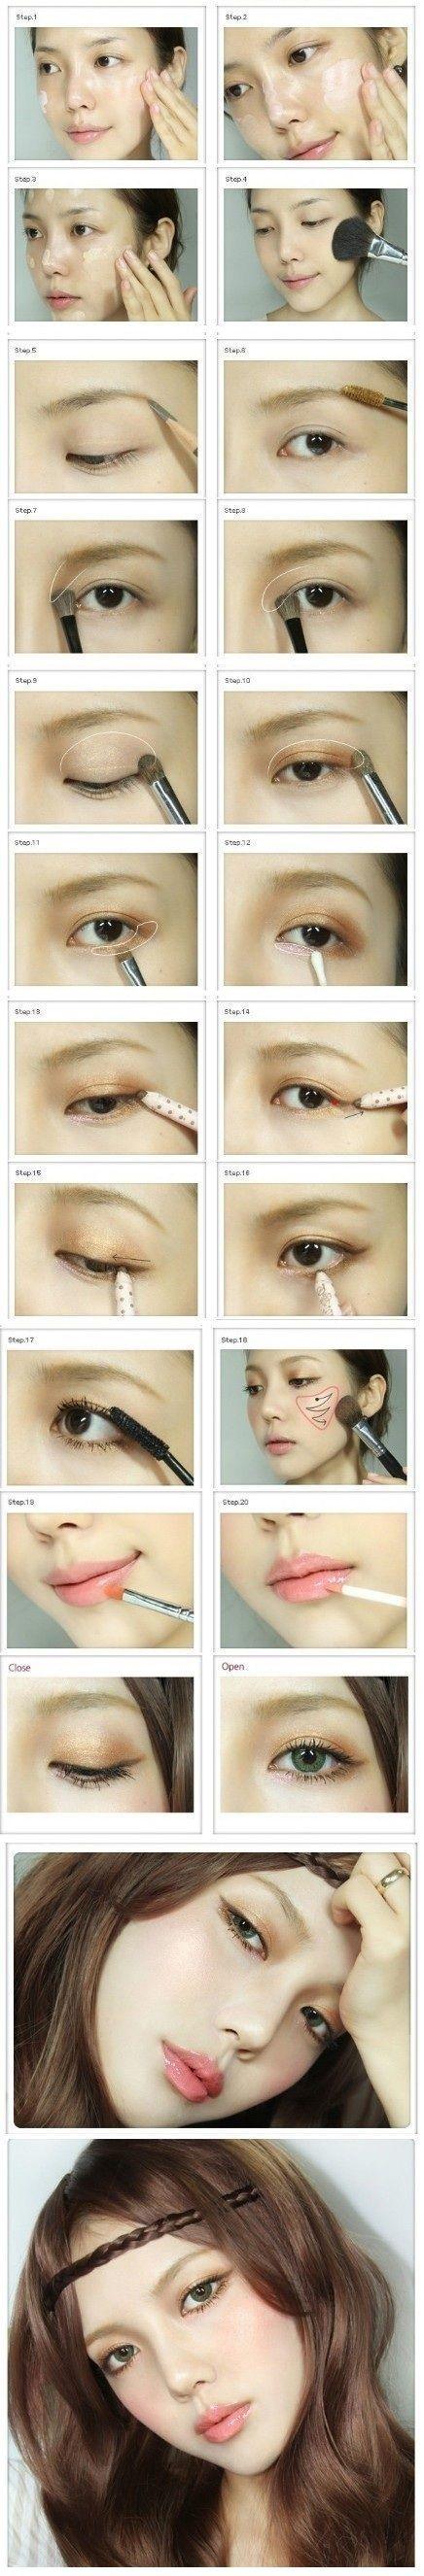 Korean eyes makeup tutorial images any tutorial examples nude makeup beauty pinterest nude makeup nude and makeup baditri images baditri Image collections